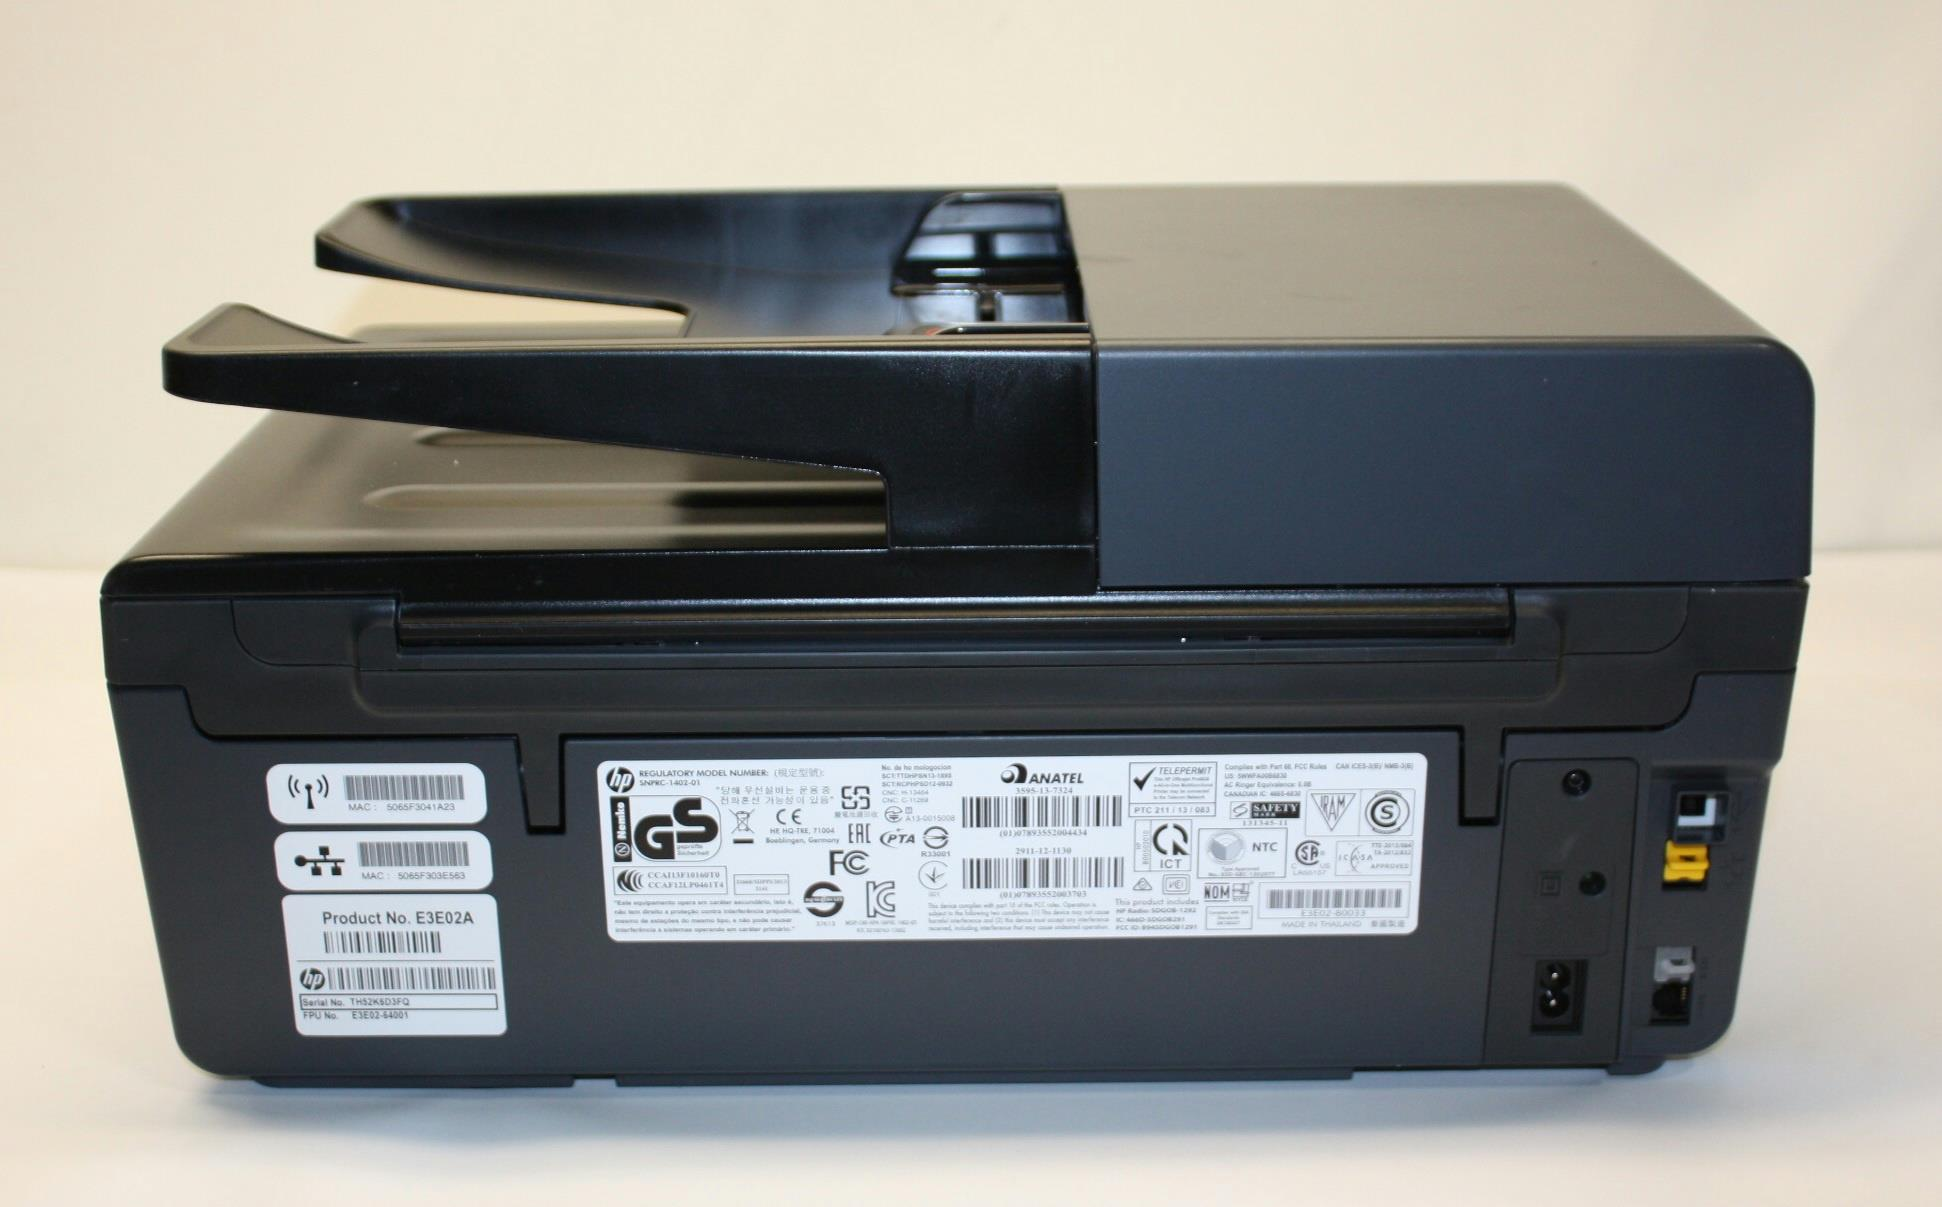 HP Officejet Pro 6830 e-All-in-One Printer E3E02A *For ...